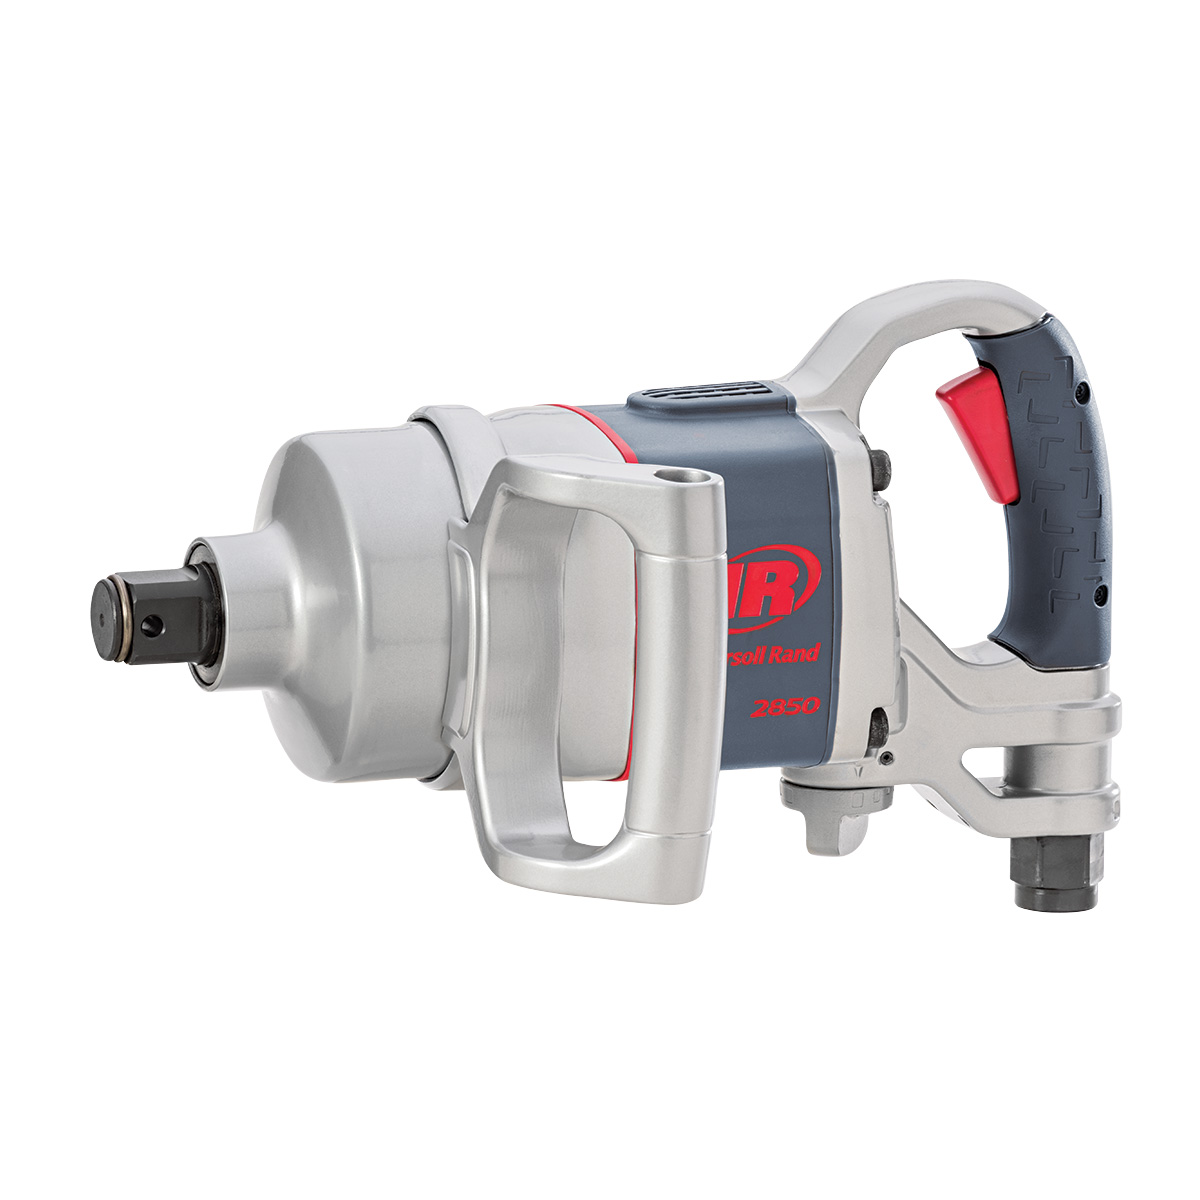 Avvitatore ad impulsi pneumatico 2850MAX Ingersoll Rand